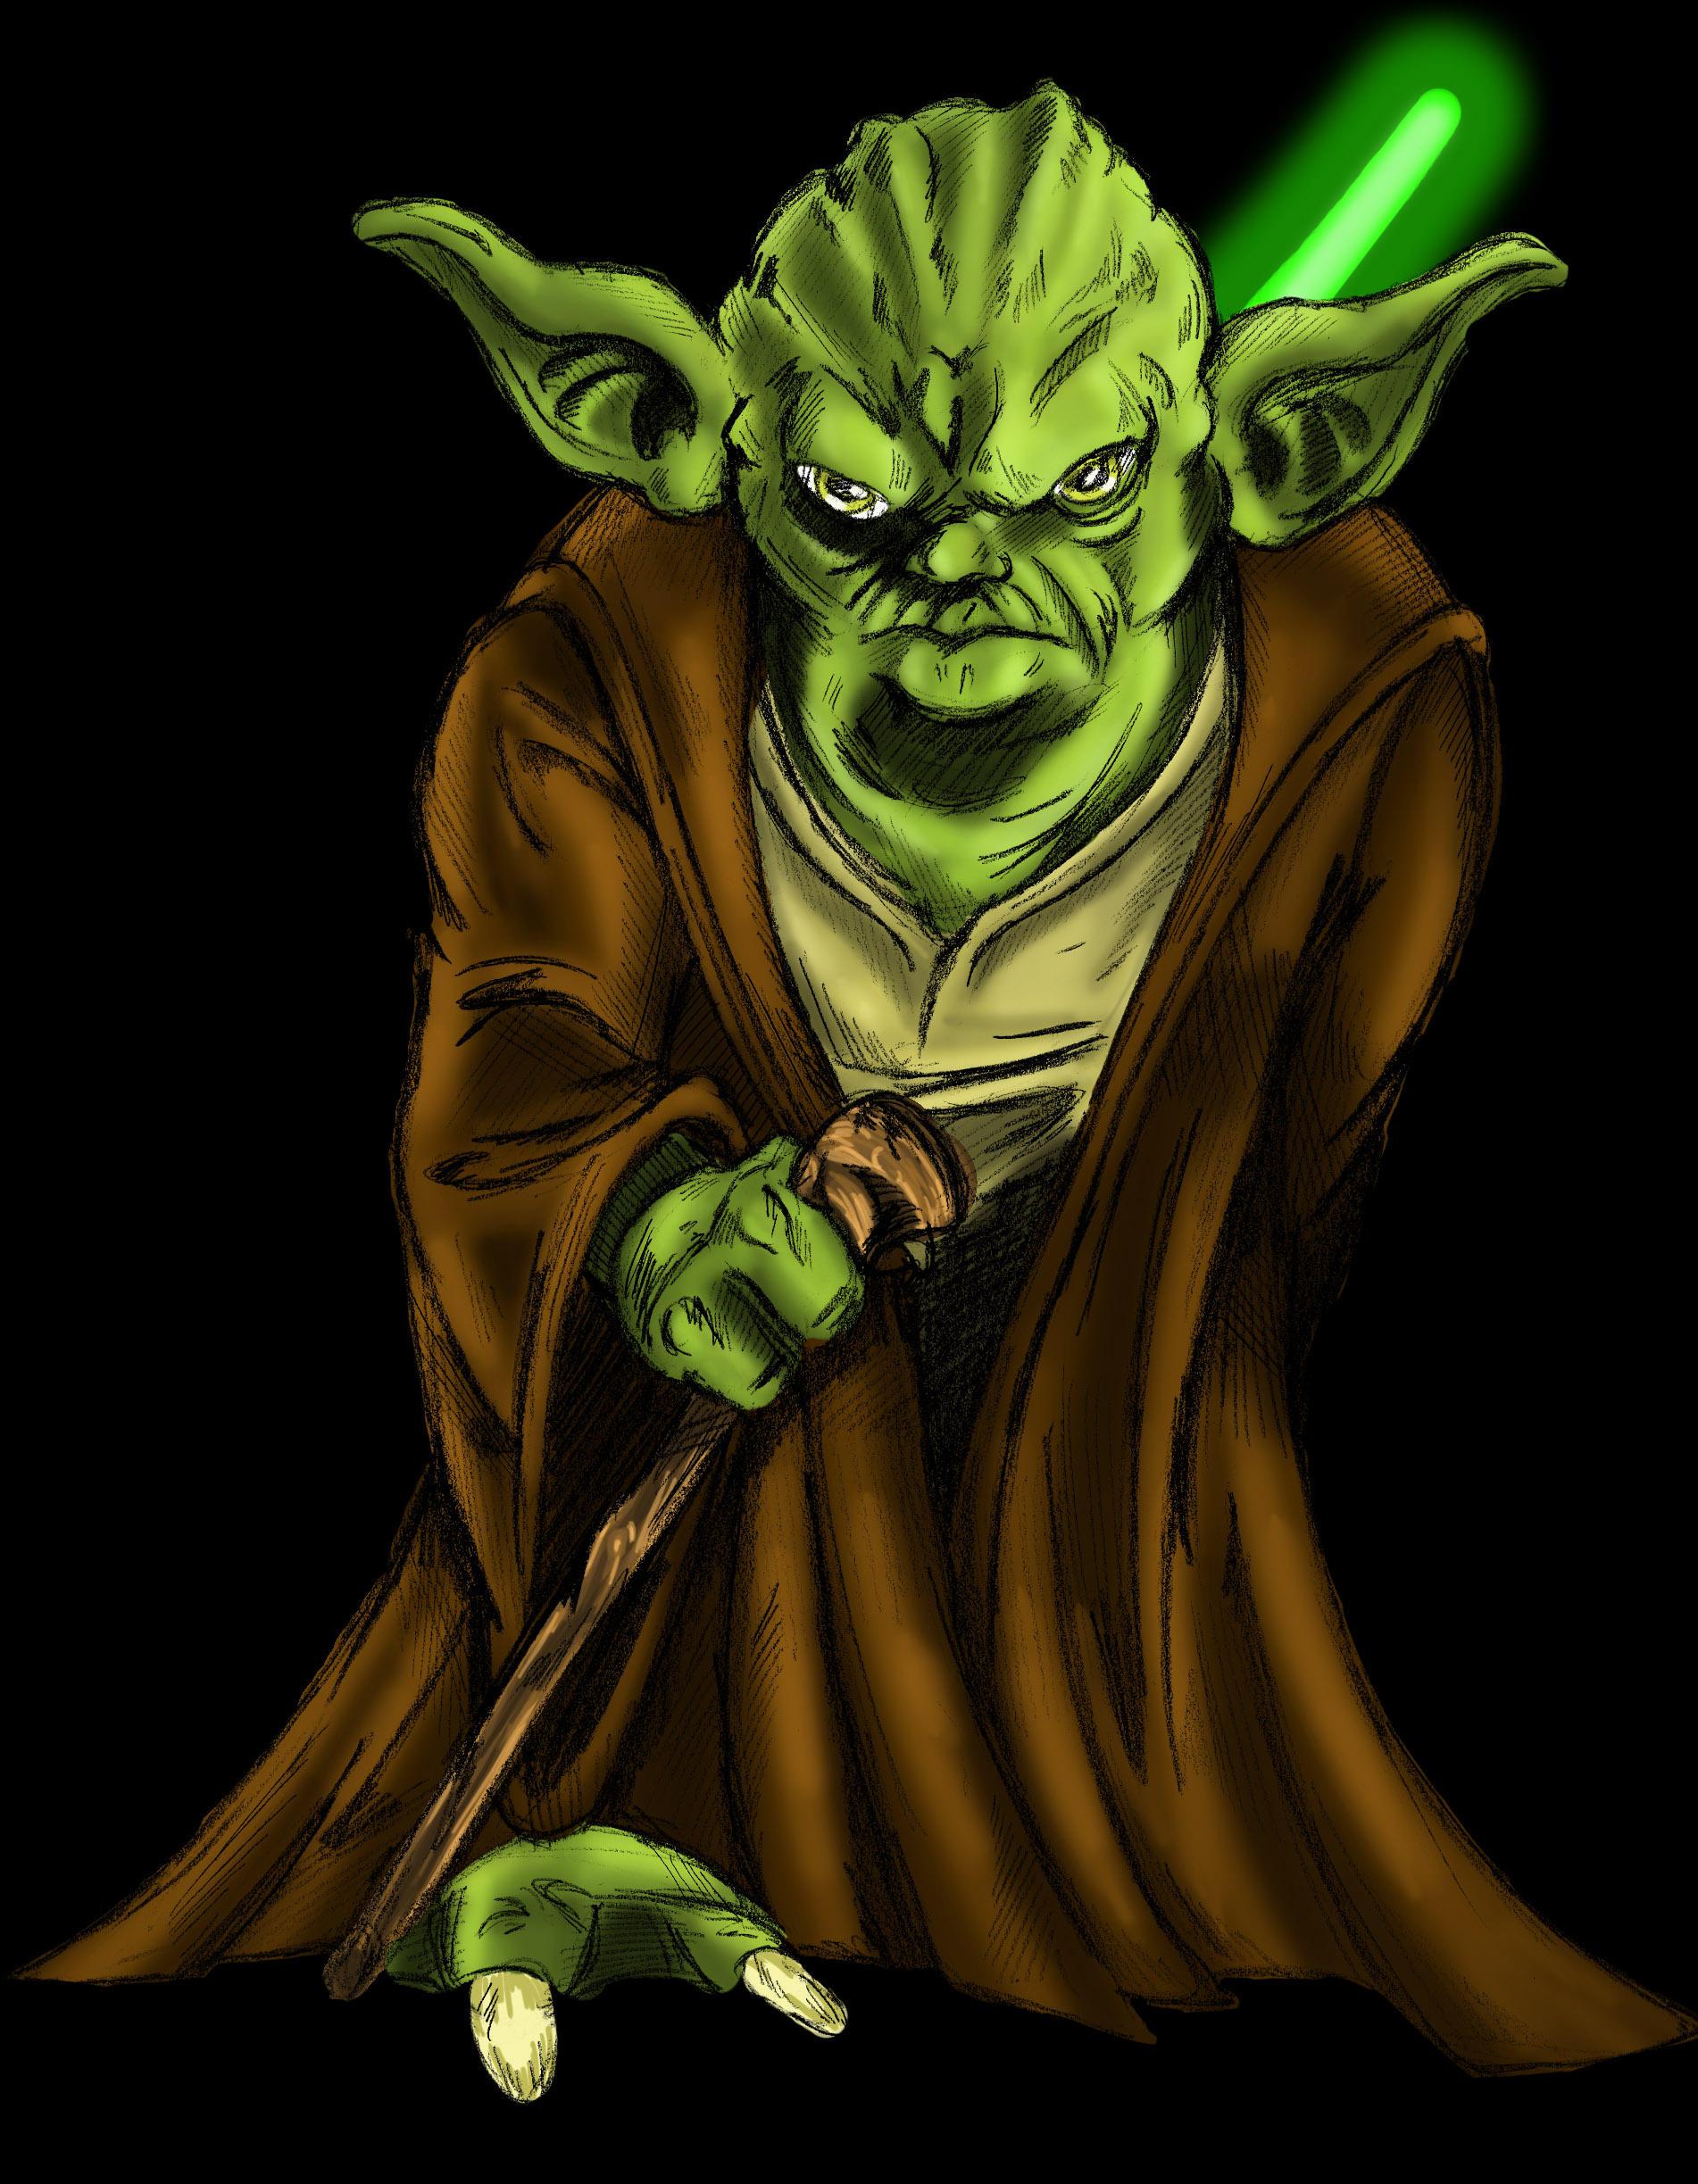 Line Art Yoda : Yoda by tactusvamp on deviantart